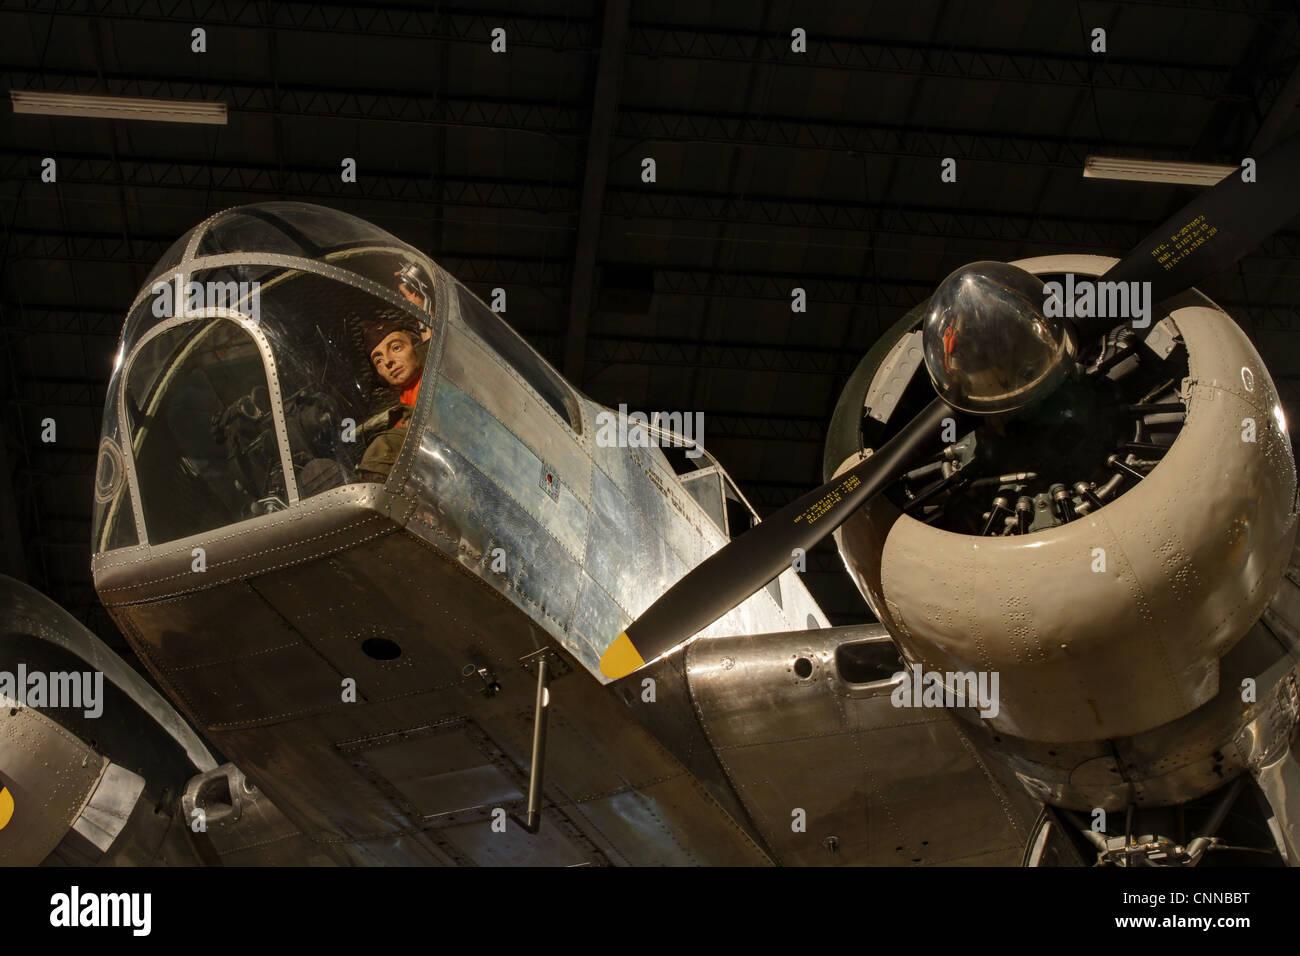 Bombardier Mannequin at the controls. Aircraft- Beech AT-11 Kansan. - Stock Image